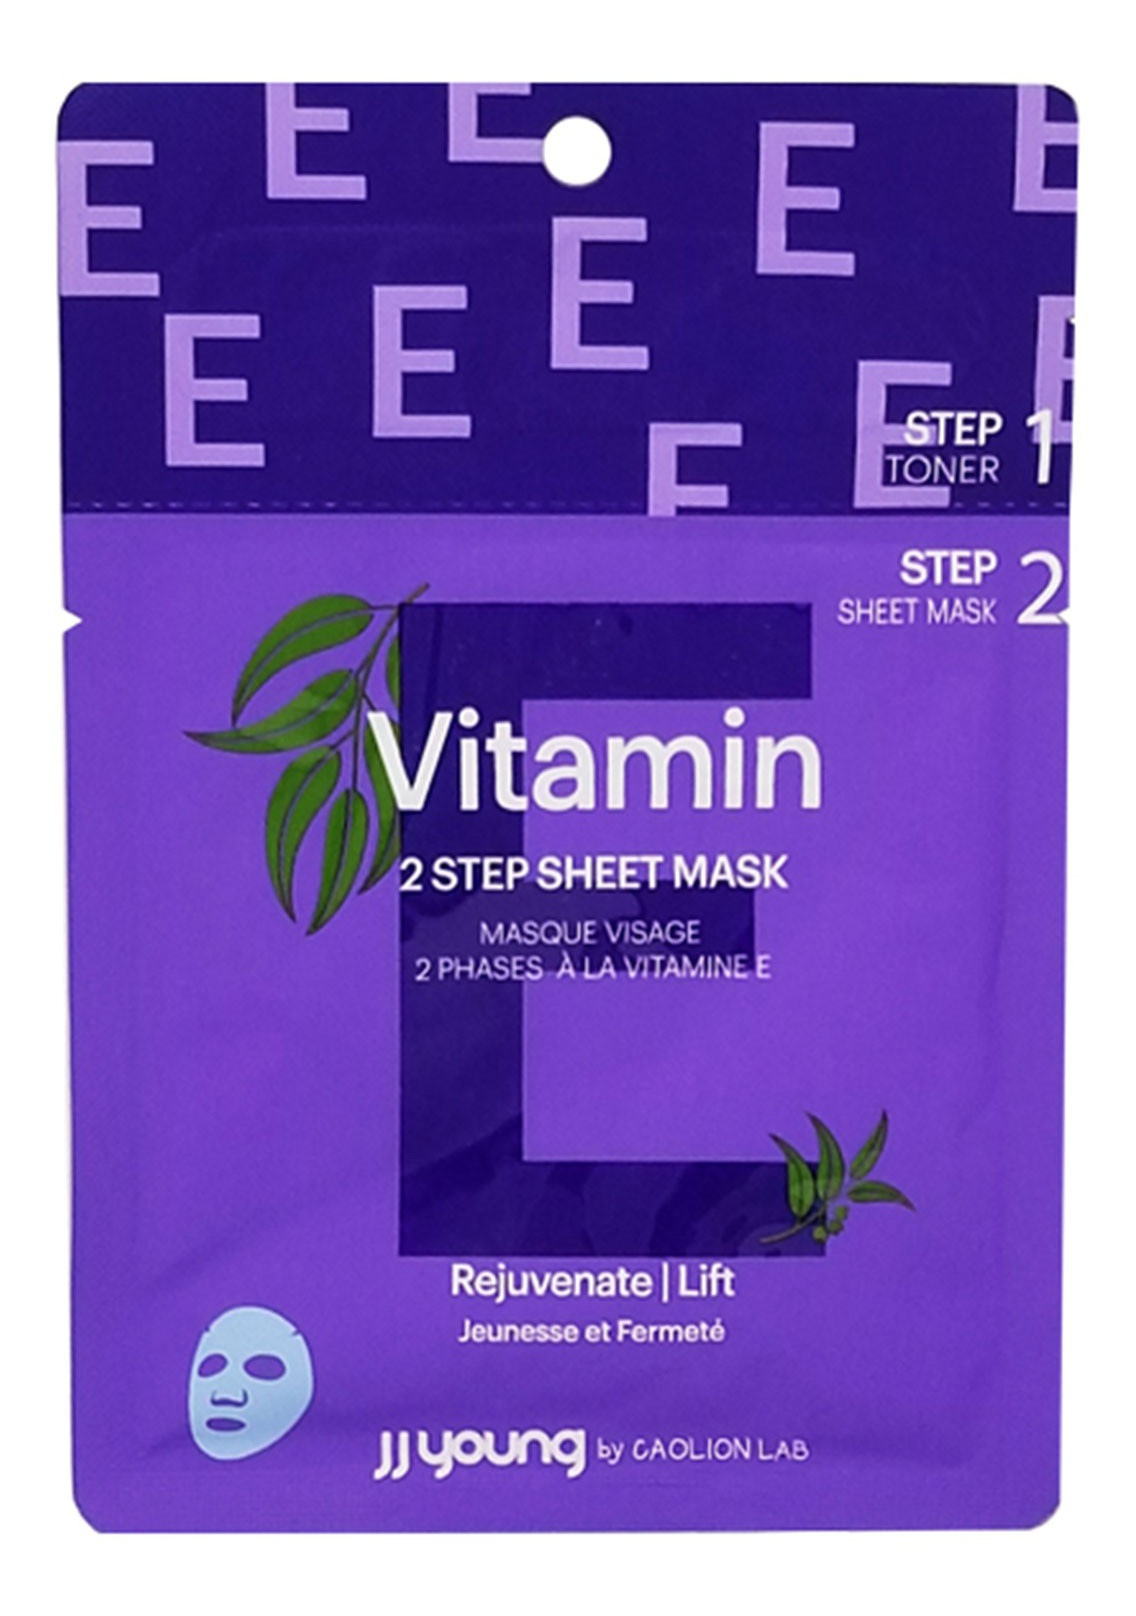 JJ young by CAOLION LAB Rejuvenate Lift Vitamin E 2 Step Sheet Mask